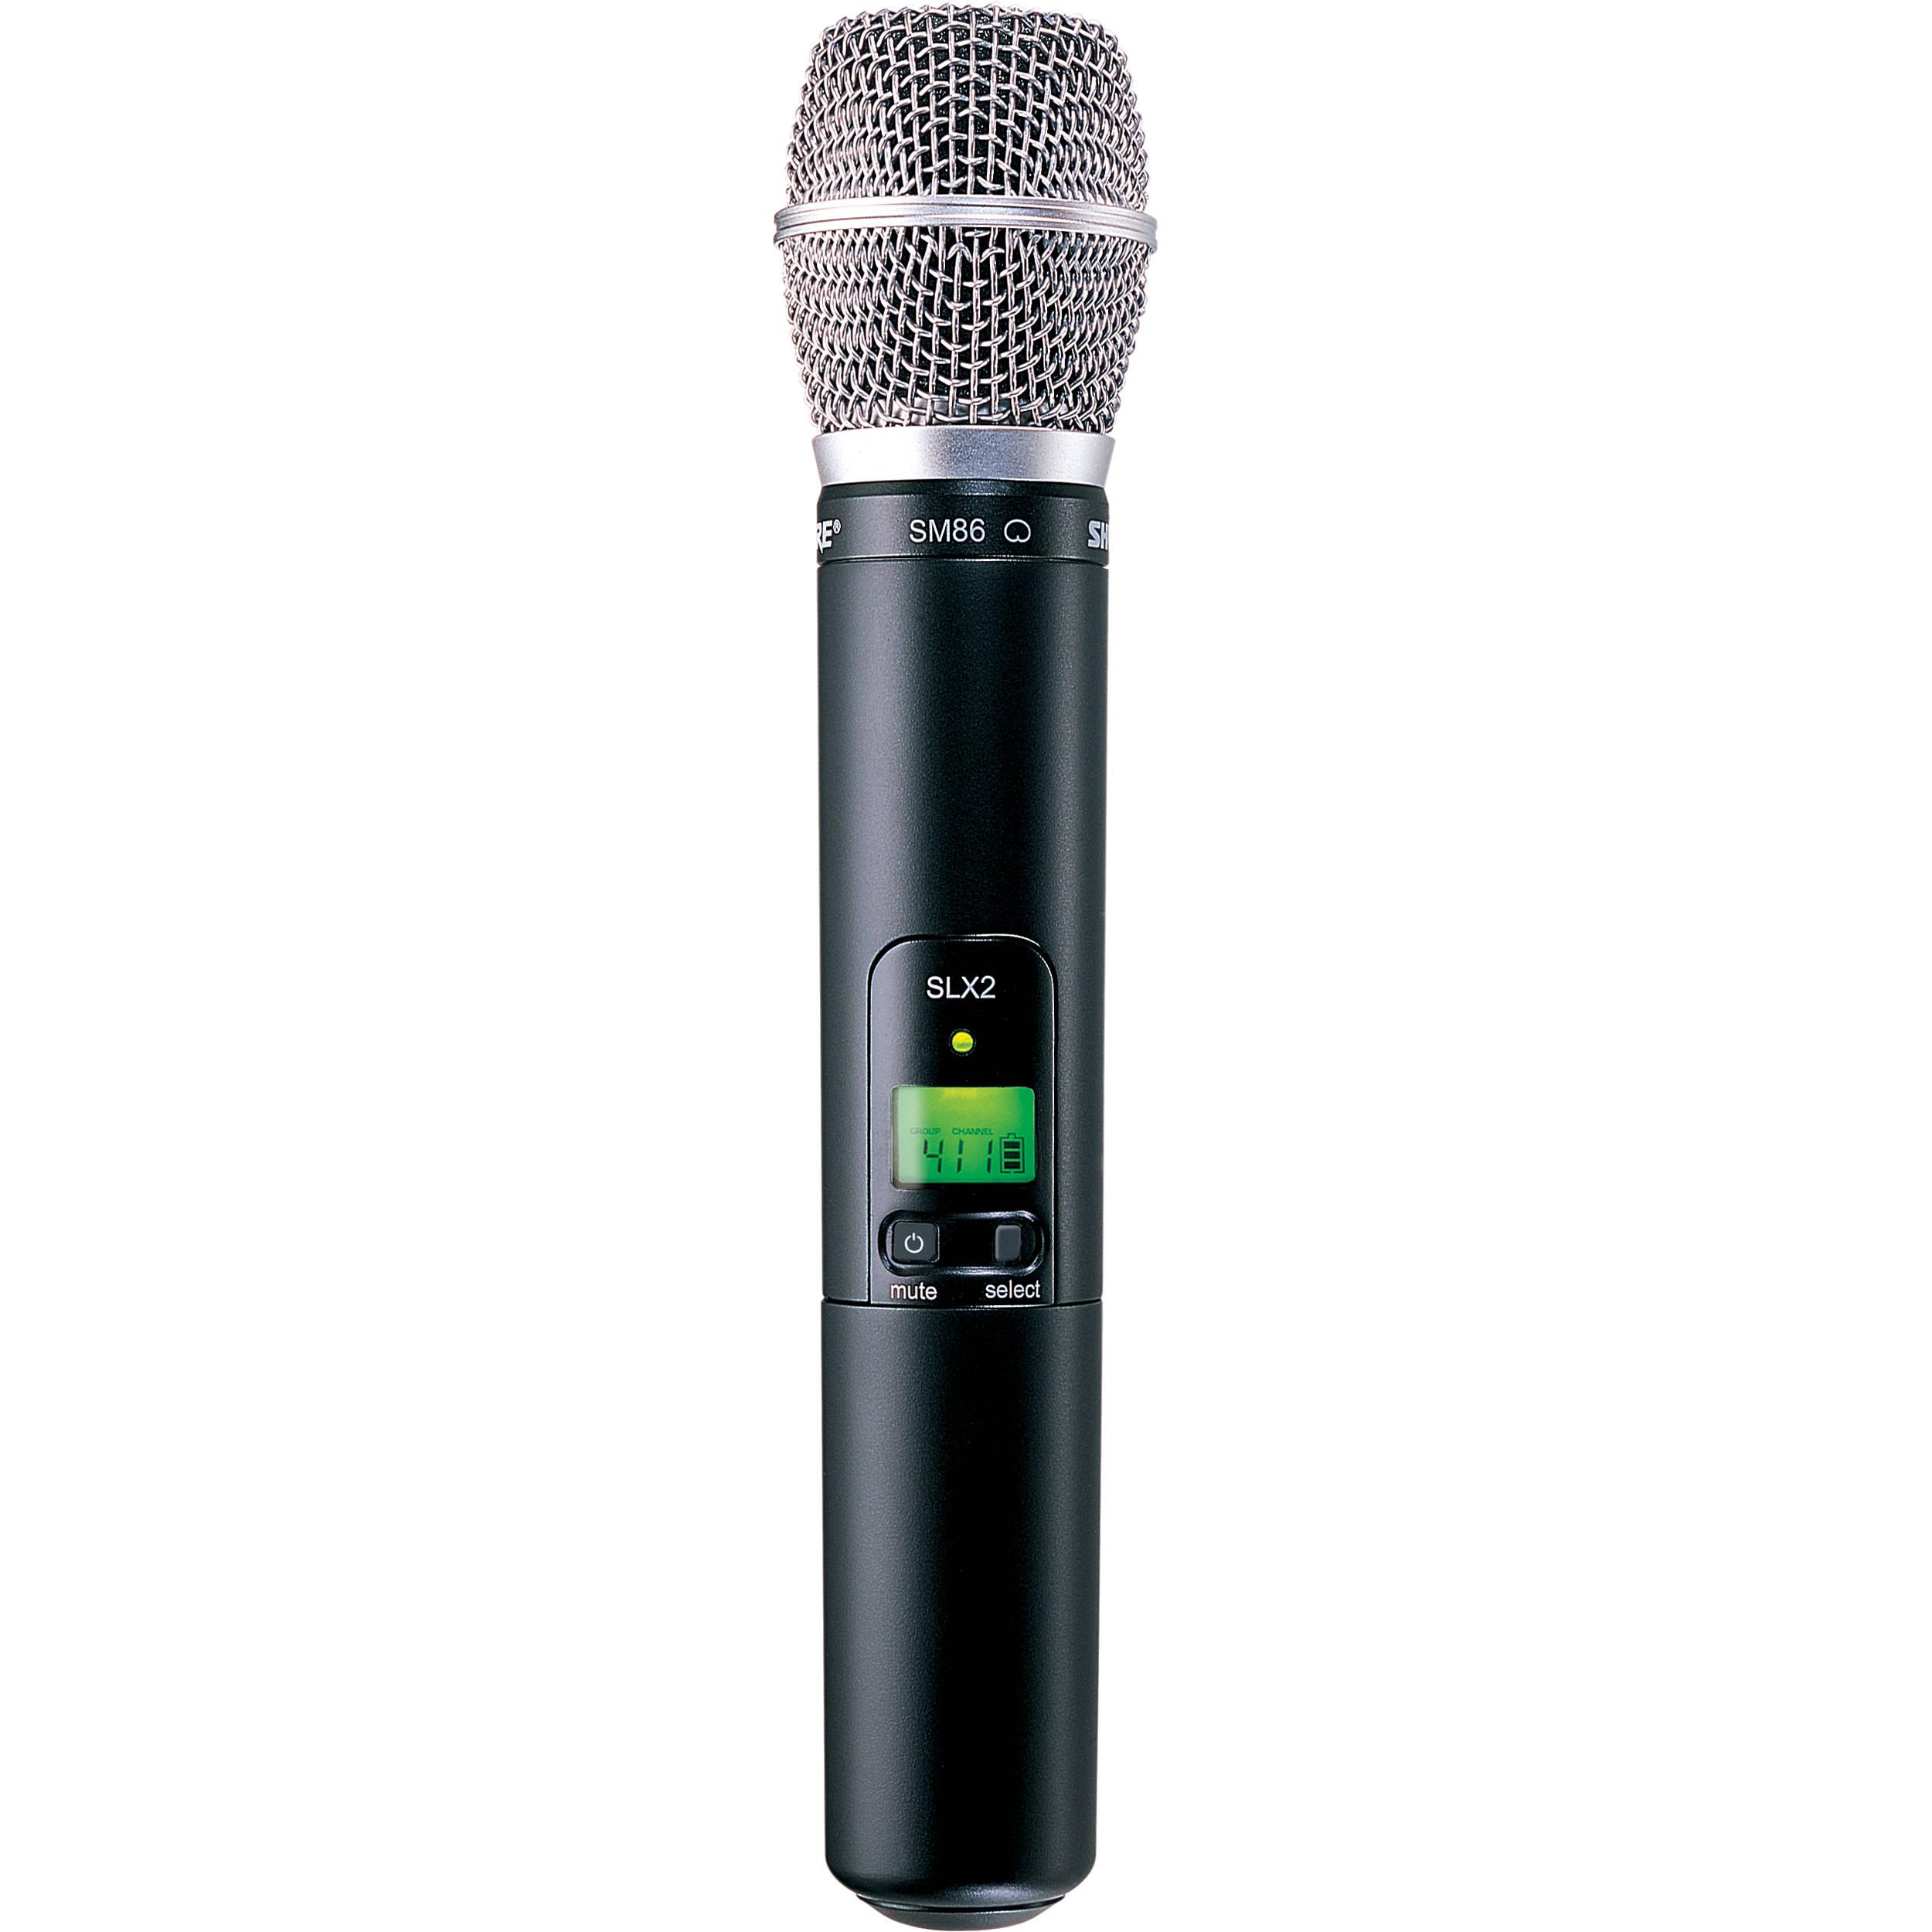 Shure Slx2 Handheld Wireless Uhf Transmitter With Sm58 Microphone : shure slx2 handheld wireless uhf transmitter slx2 sm86 h19 b h ~ Russianpoet.info Haus und Dekorationen